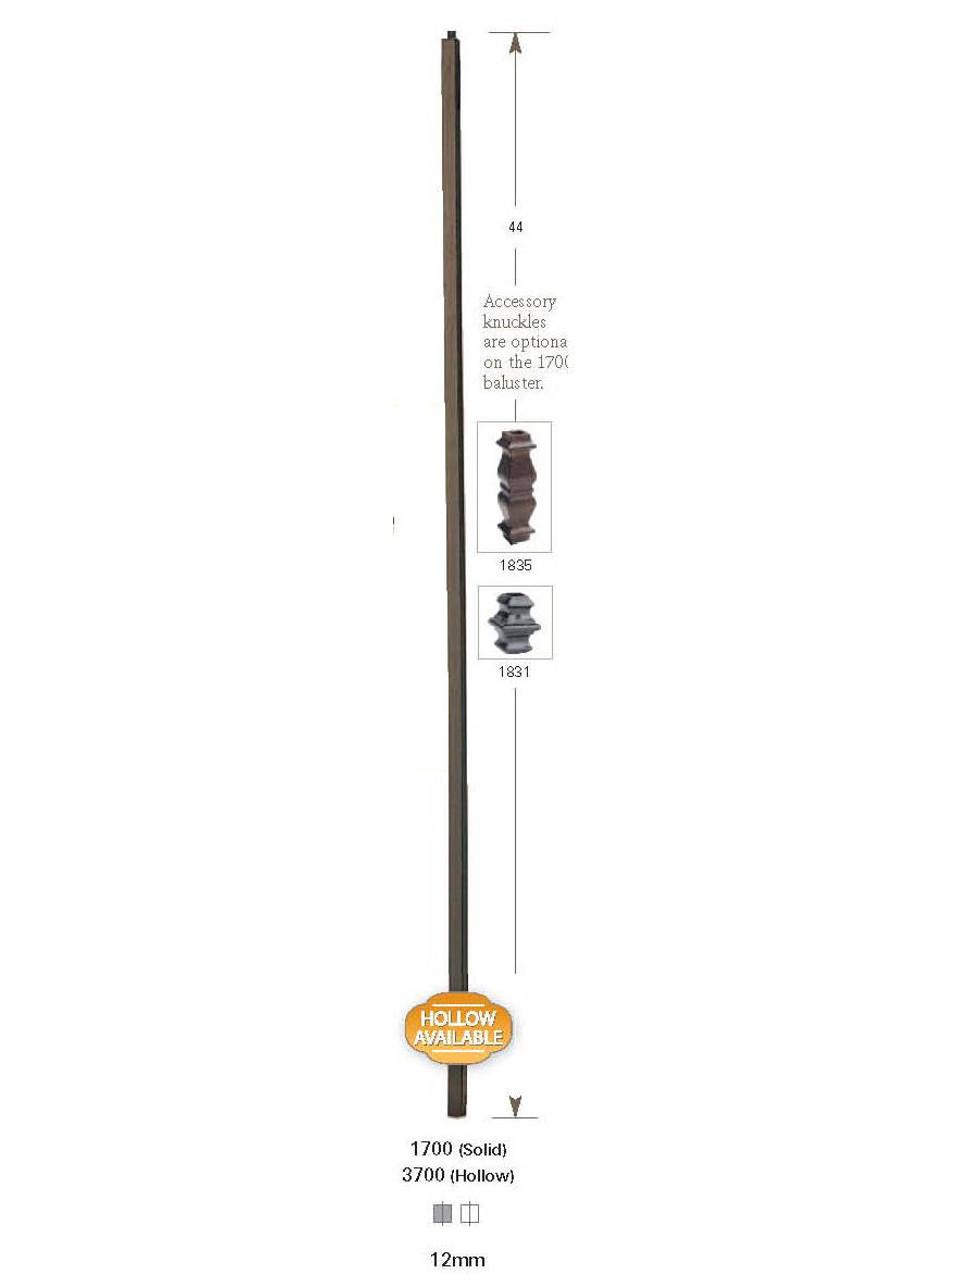 1700 Plain Straight Bar 12mm Iron Baluster